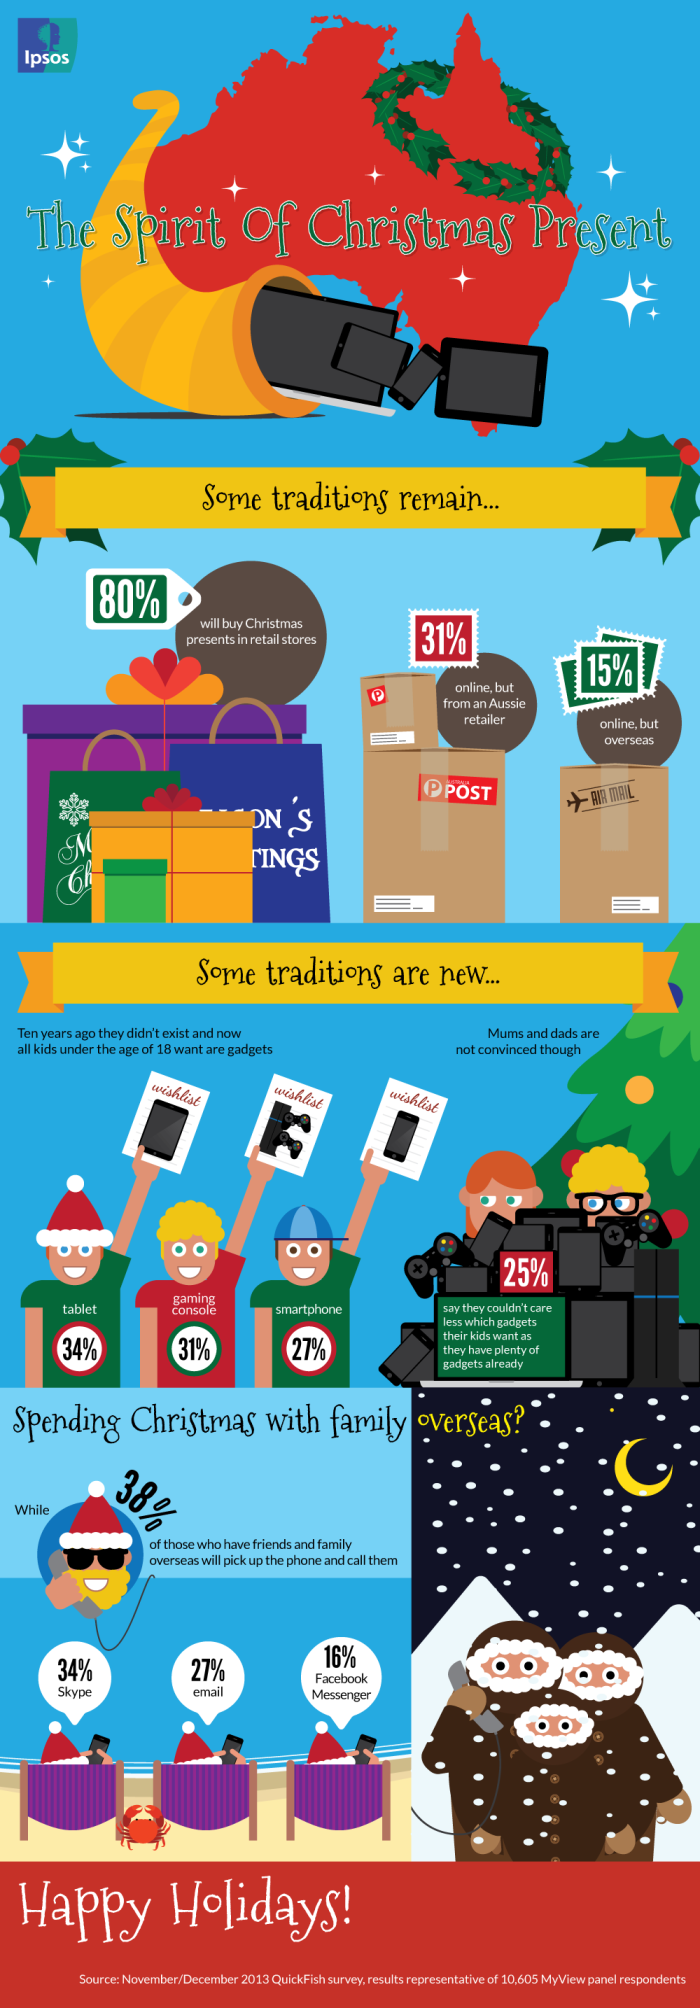 7 Ipsos_The-spirit-of-Christmas-present